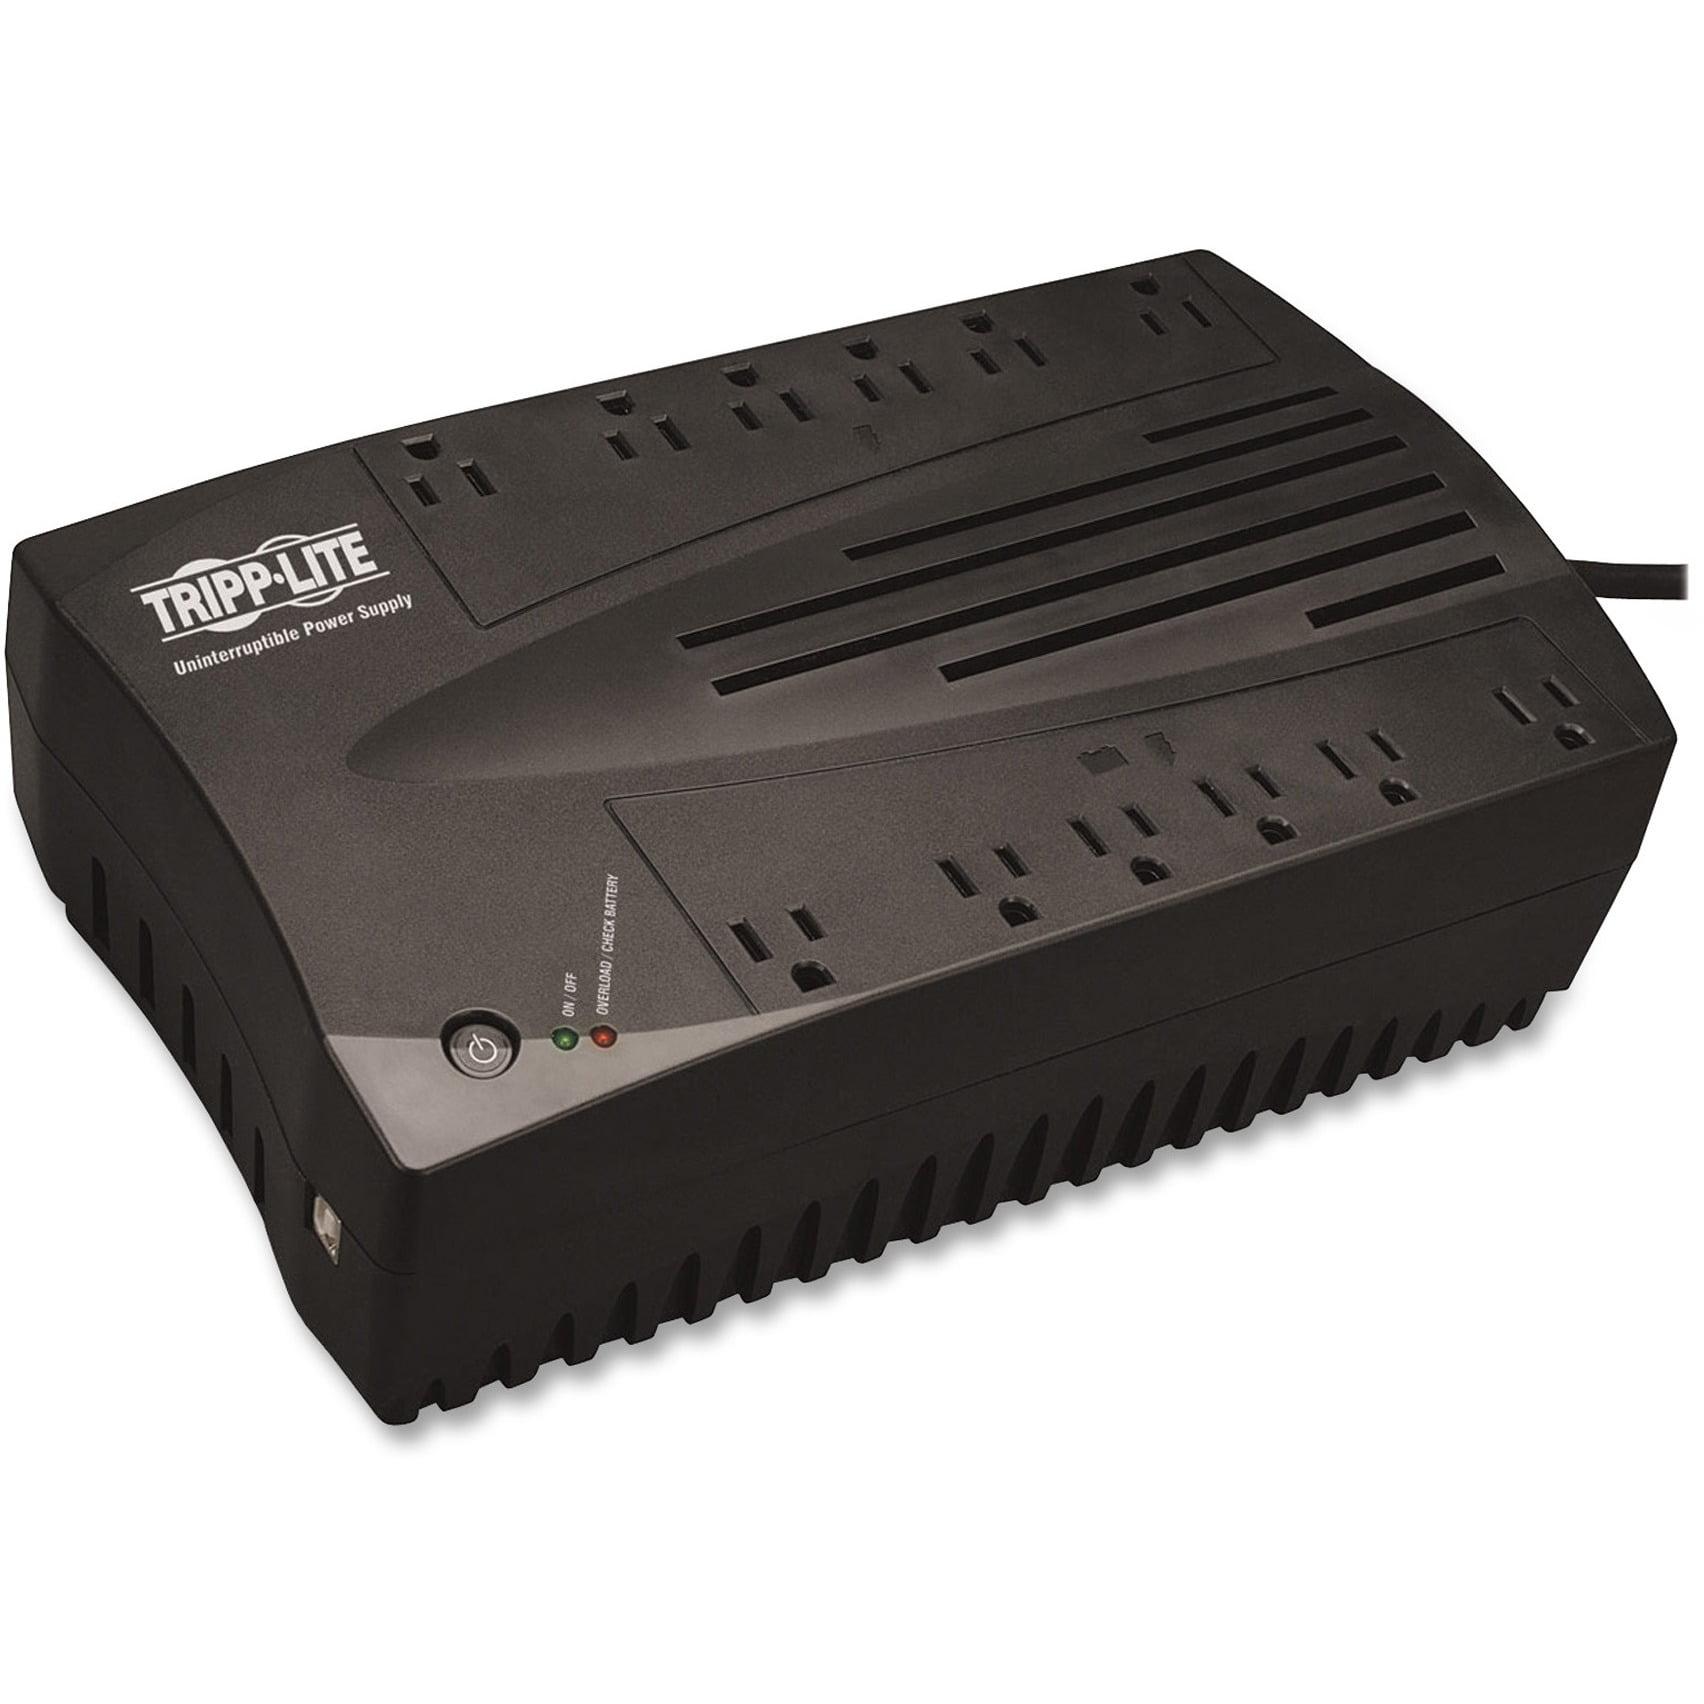 Tripp Lite, TRPAVR900U, AVR Series 900VA Mini Desktop UPS by Tripp Lite